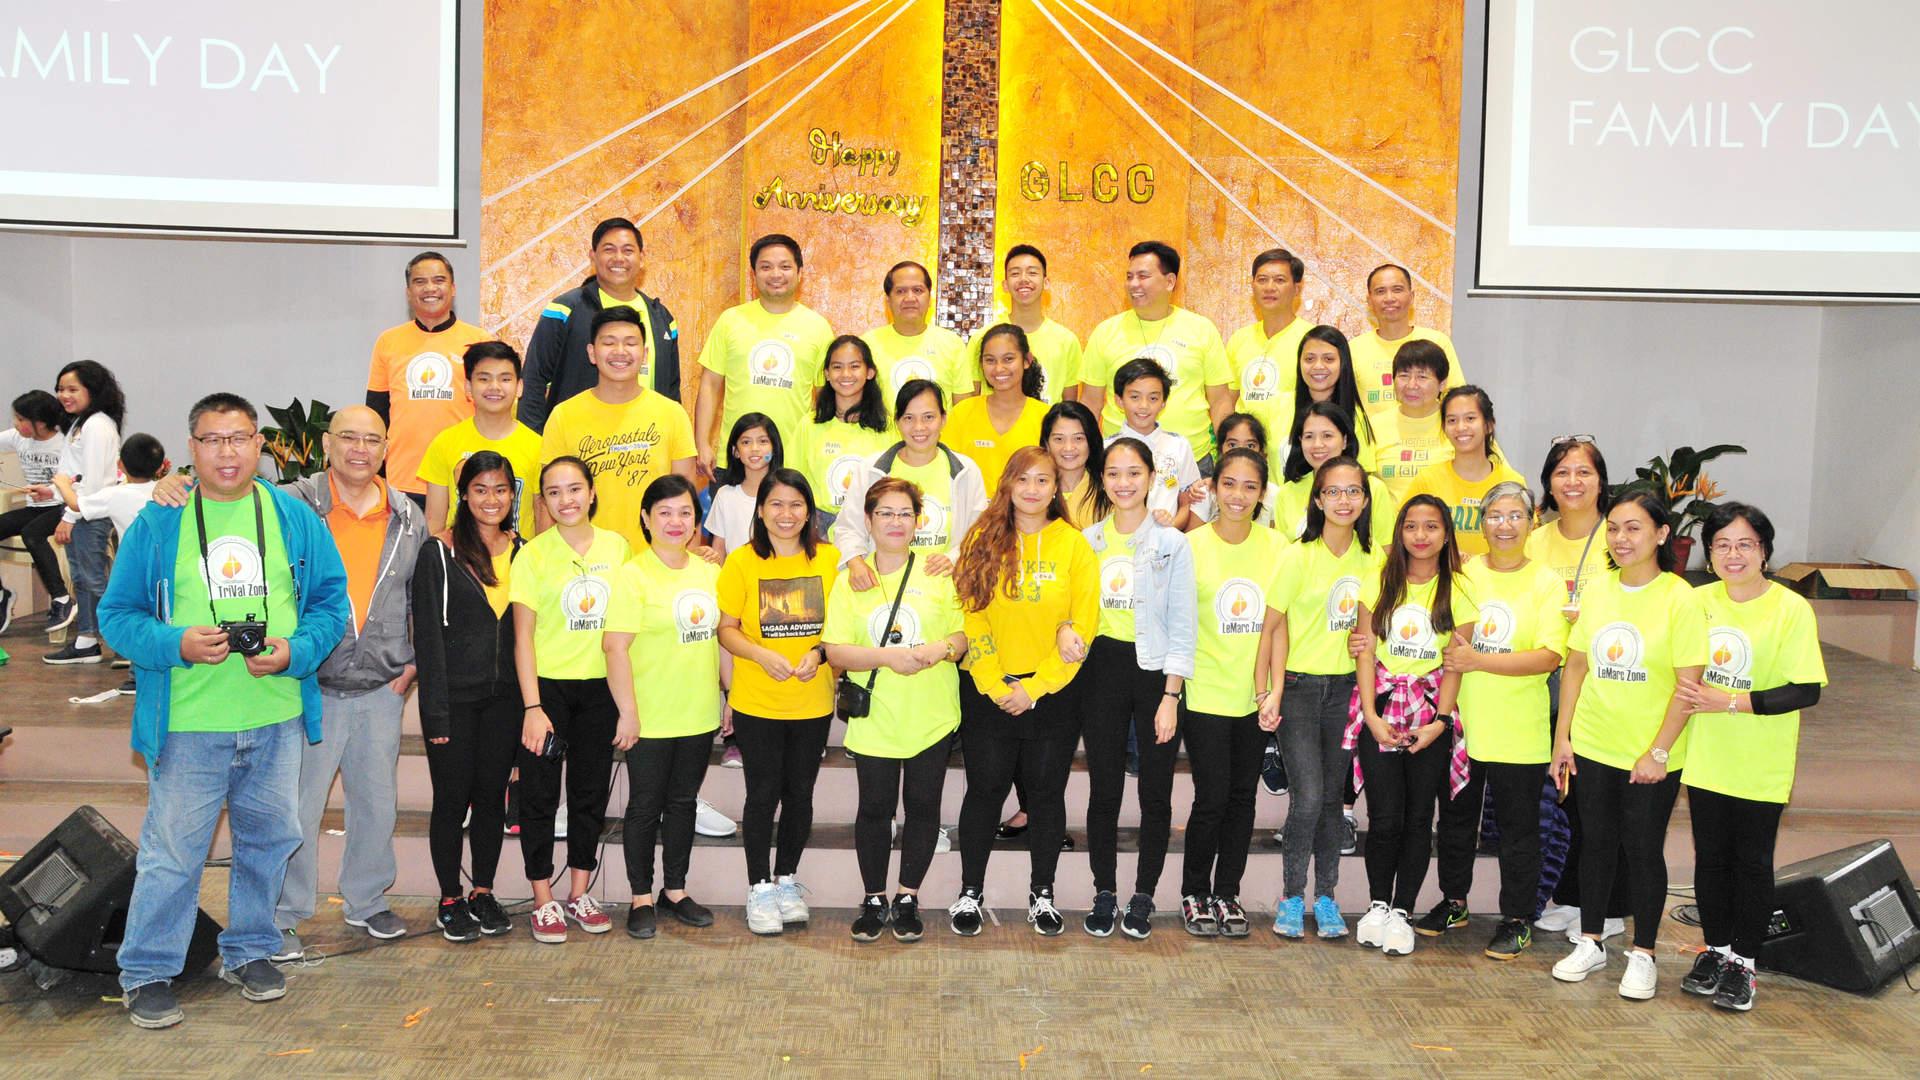 GLCC Family Day 2018 (13)